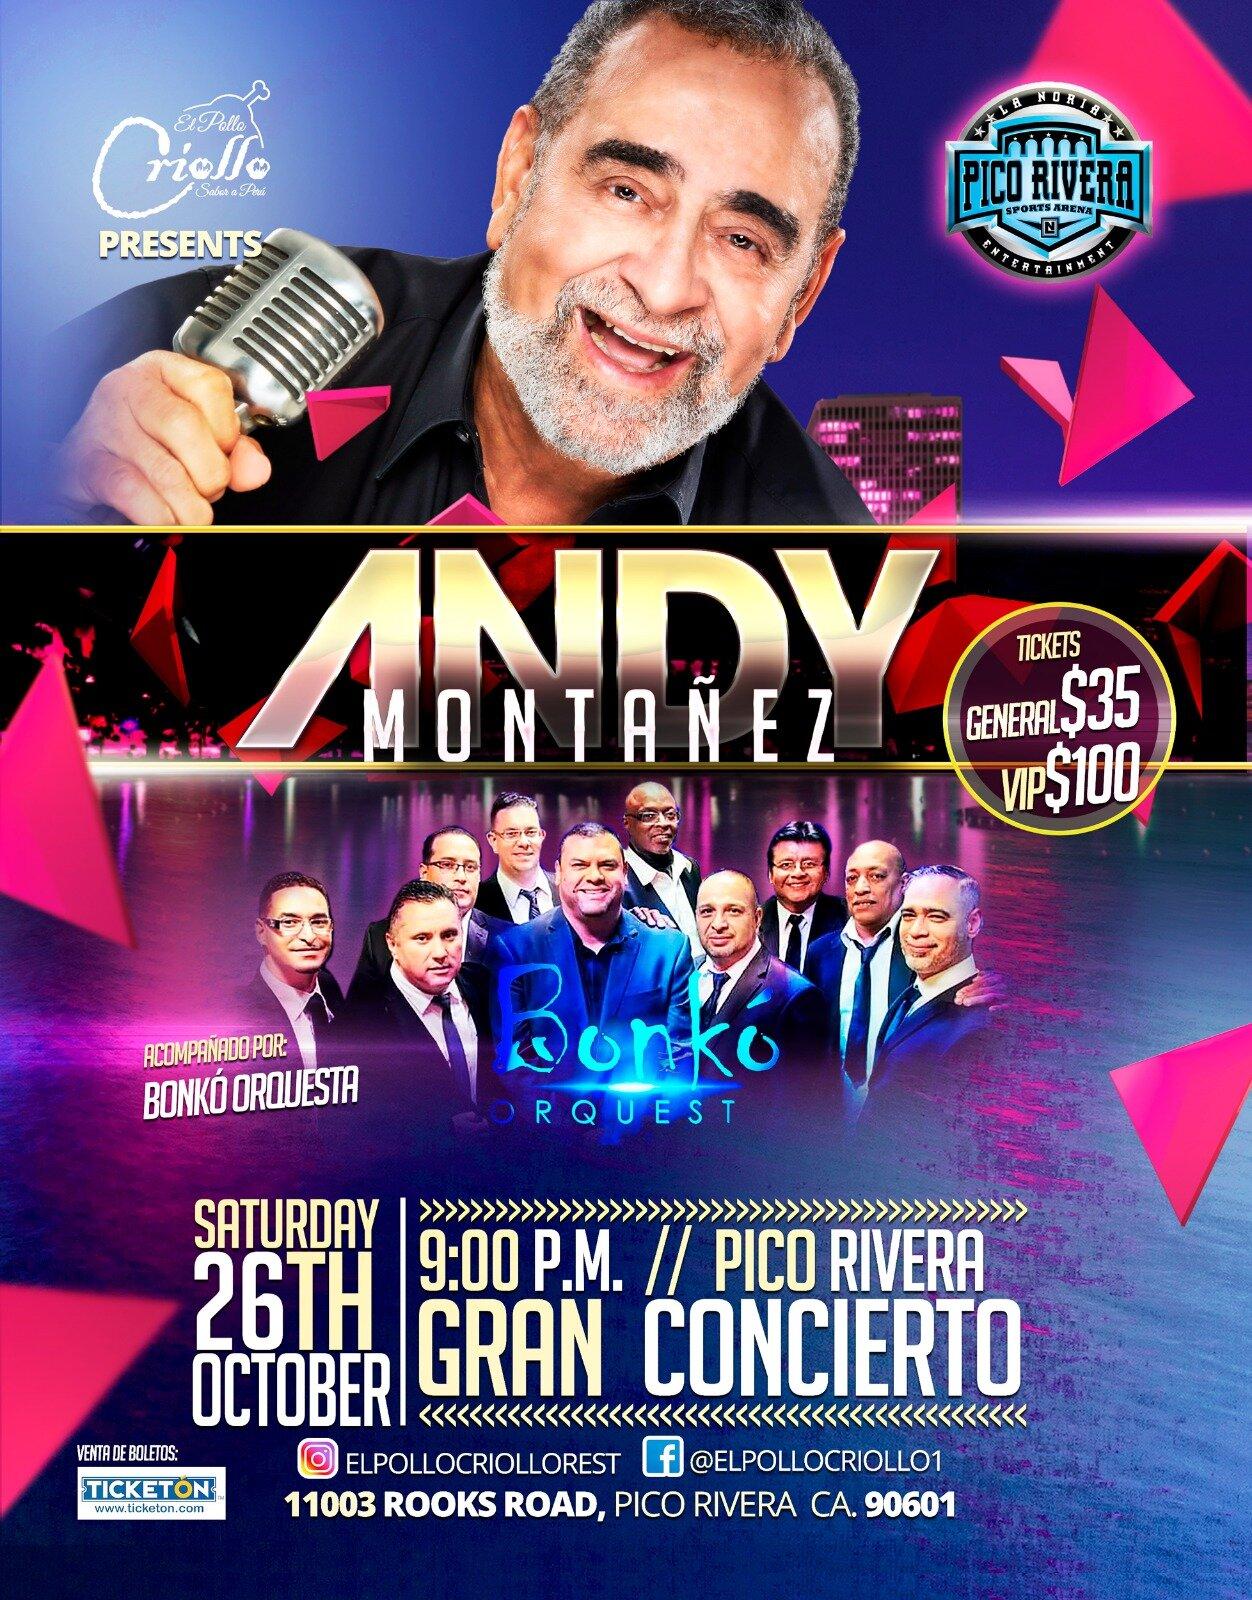 ANDY MONTAÑEZ - SÁBADO 26 DE OCTUBRE 2019